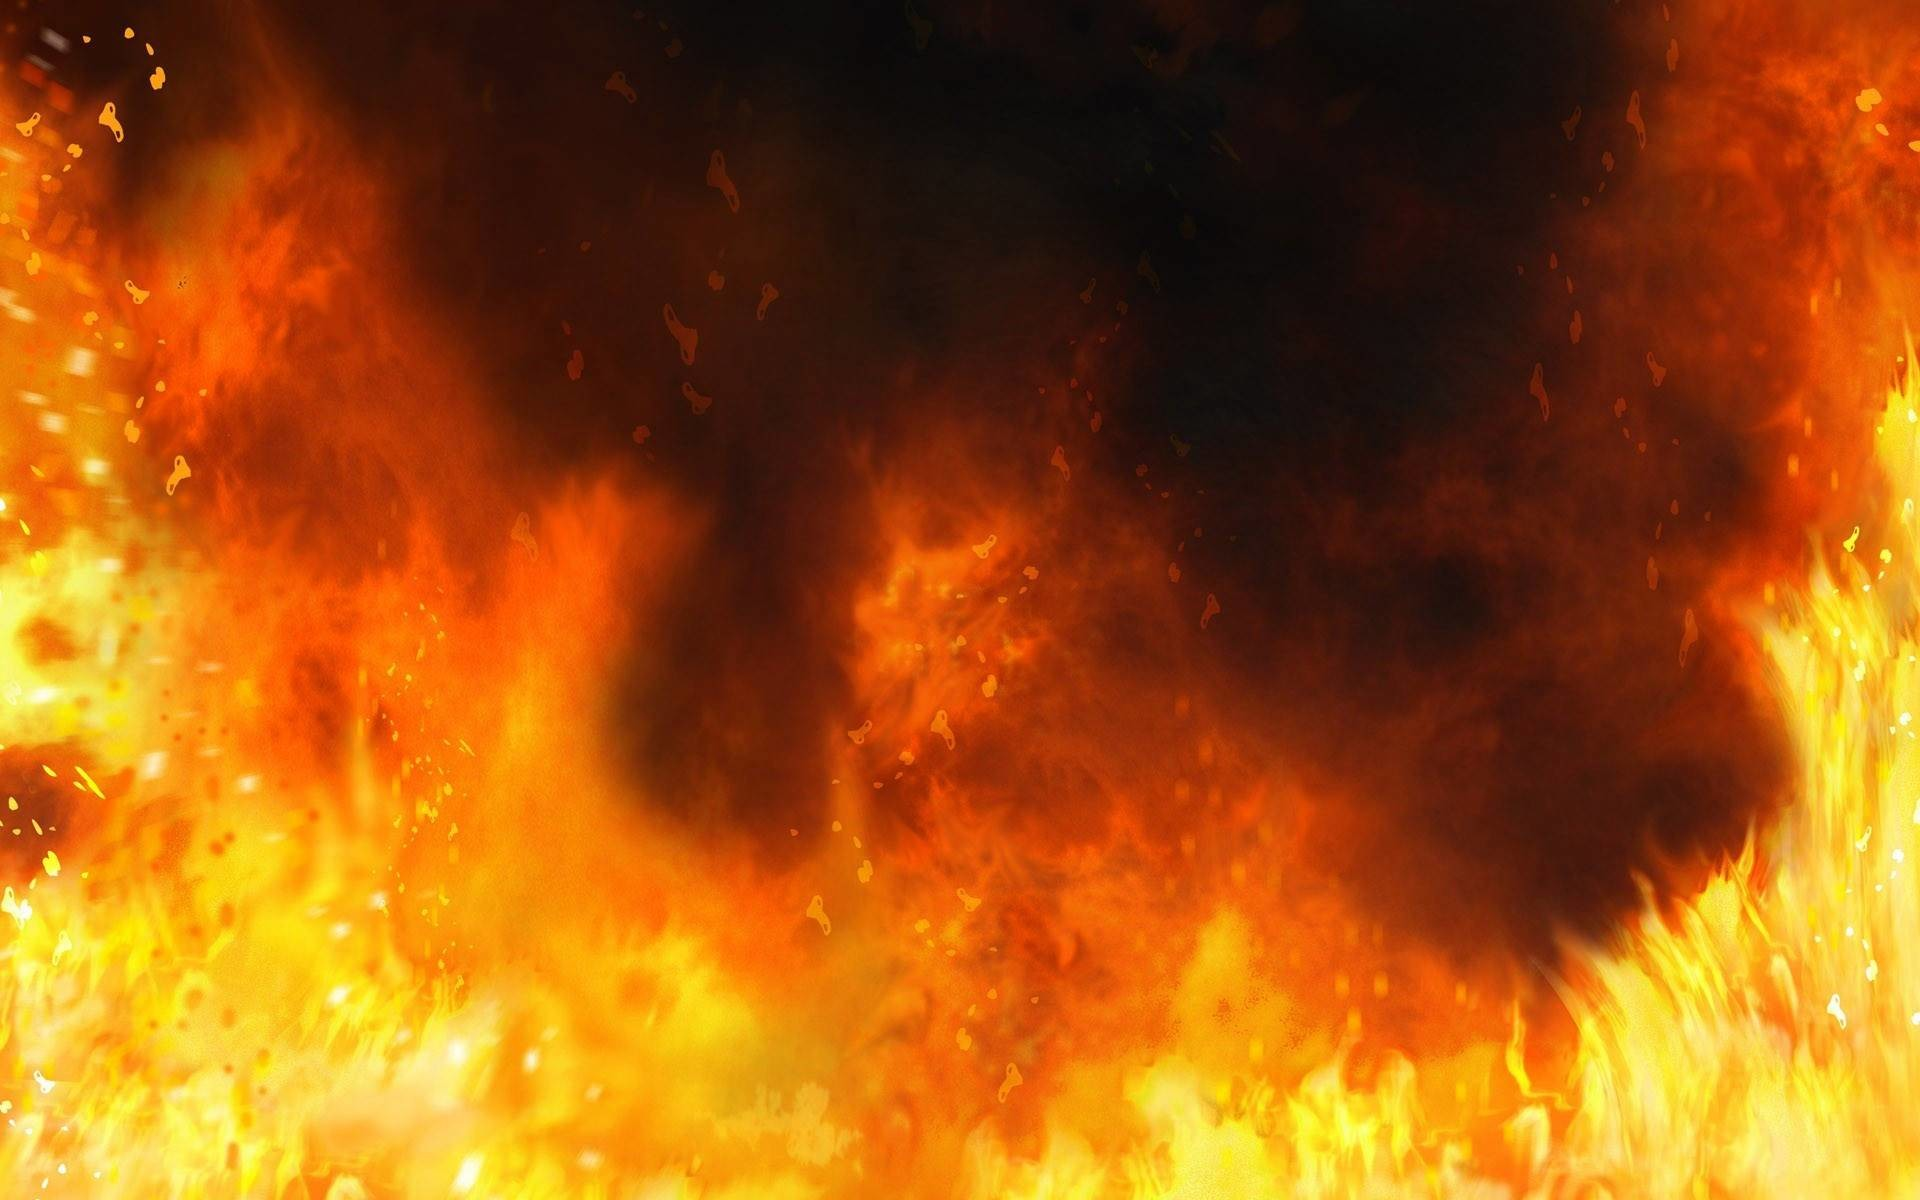 Fire Background , HD Wallpaper & Backgrounds